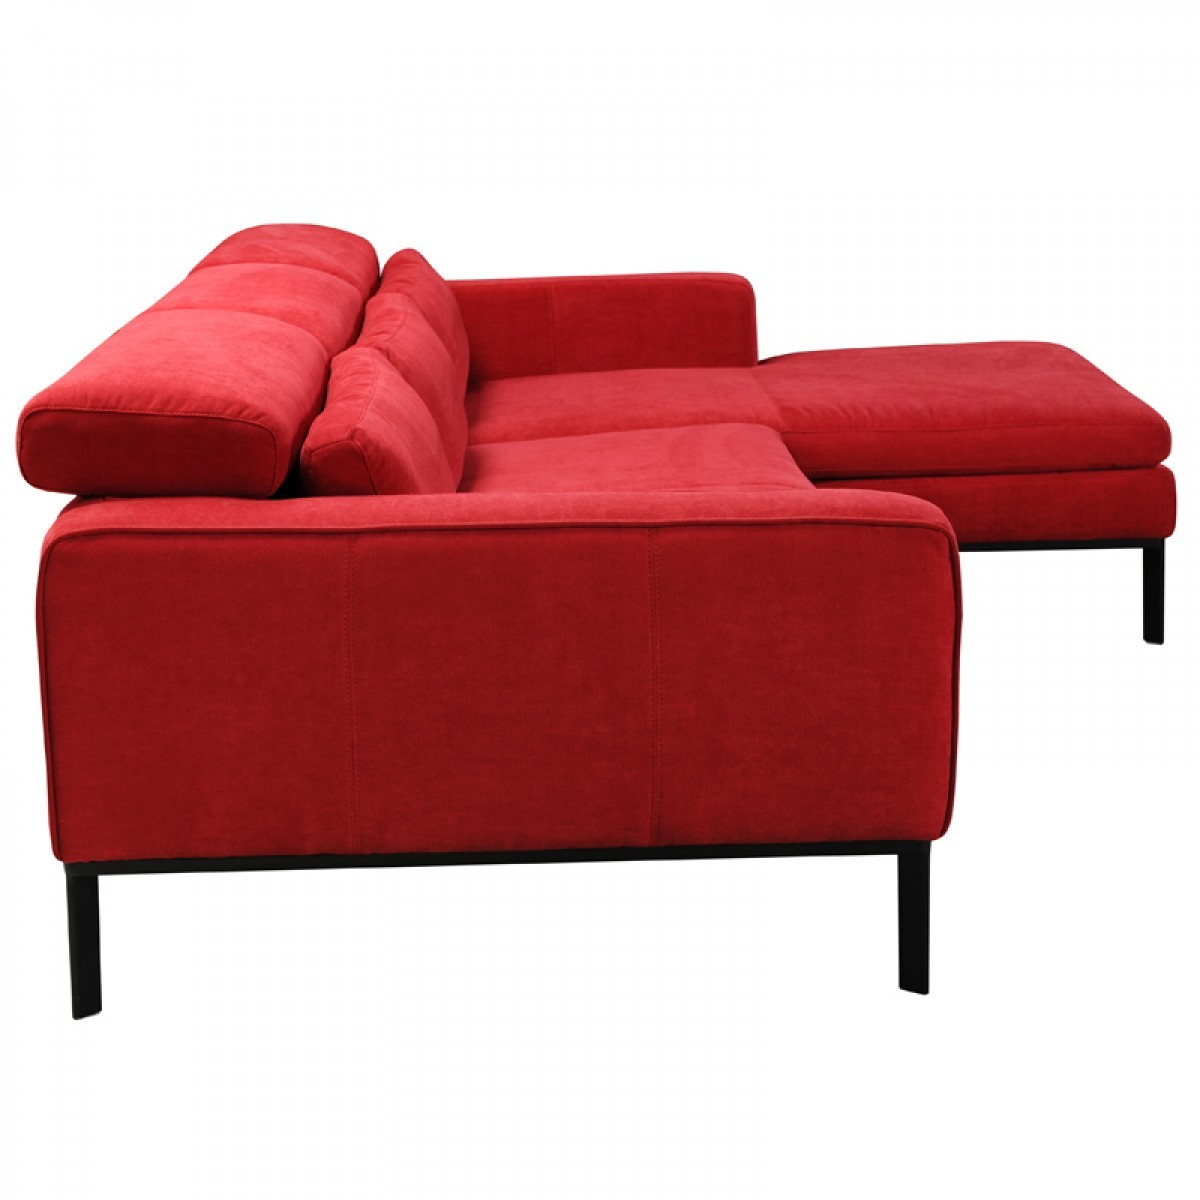 clayton sofa wholesale sofas divani casa modern red fabric sectional